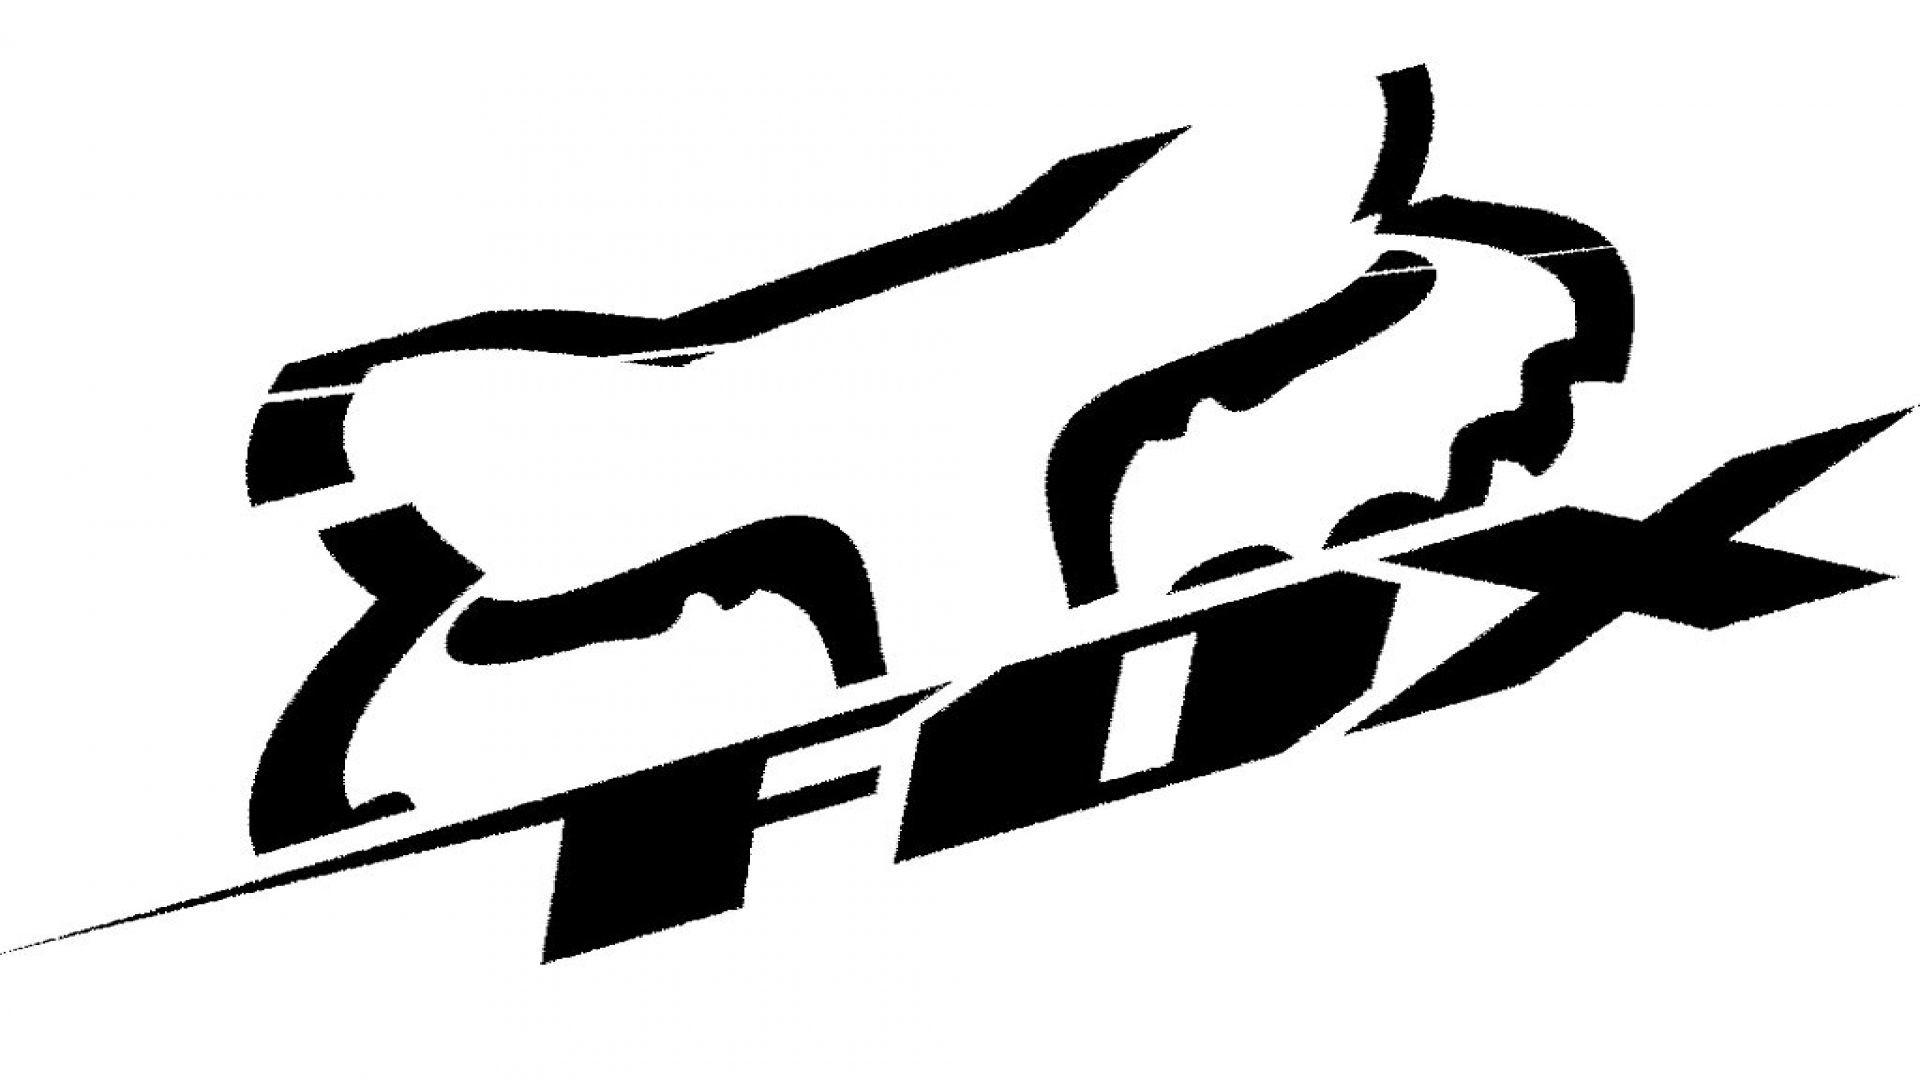 Fox And Monster Logo Wallpaper 53 Images